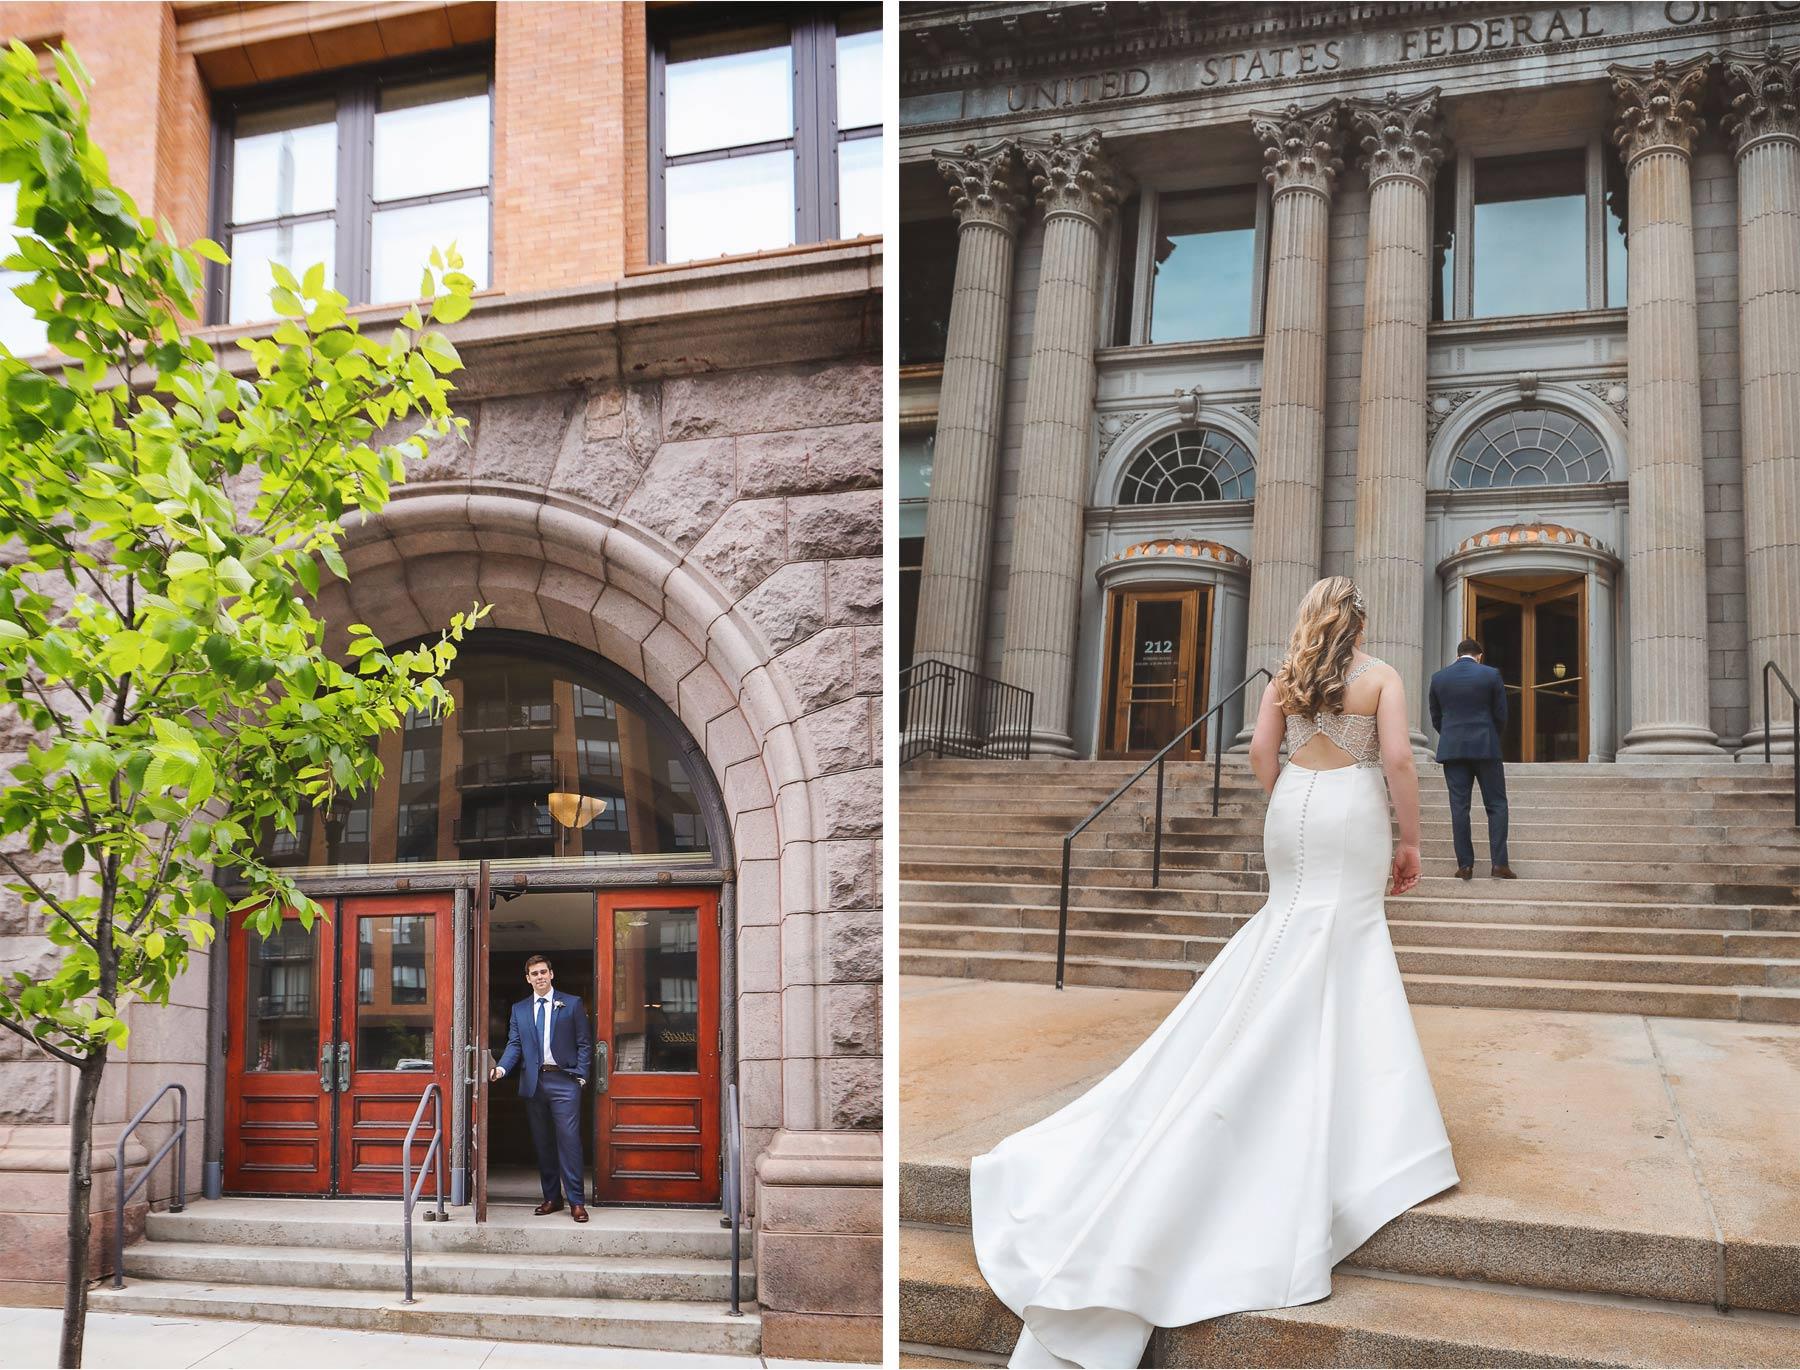 05-Minneapolis-Minnesota-Wedding-Vick-Photography-The-Depot-Bride-Groom-First-Look-Amelia-and-Alexander.jpg